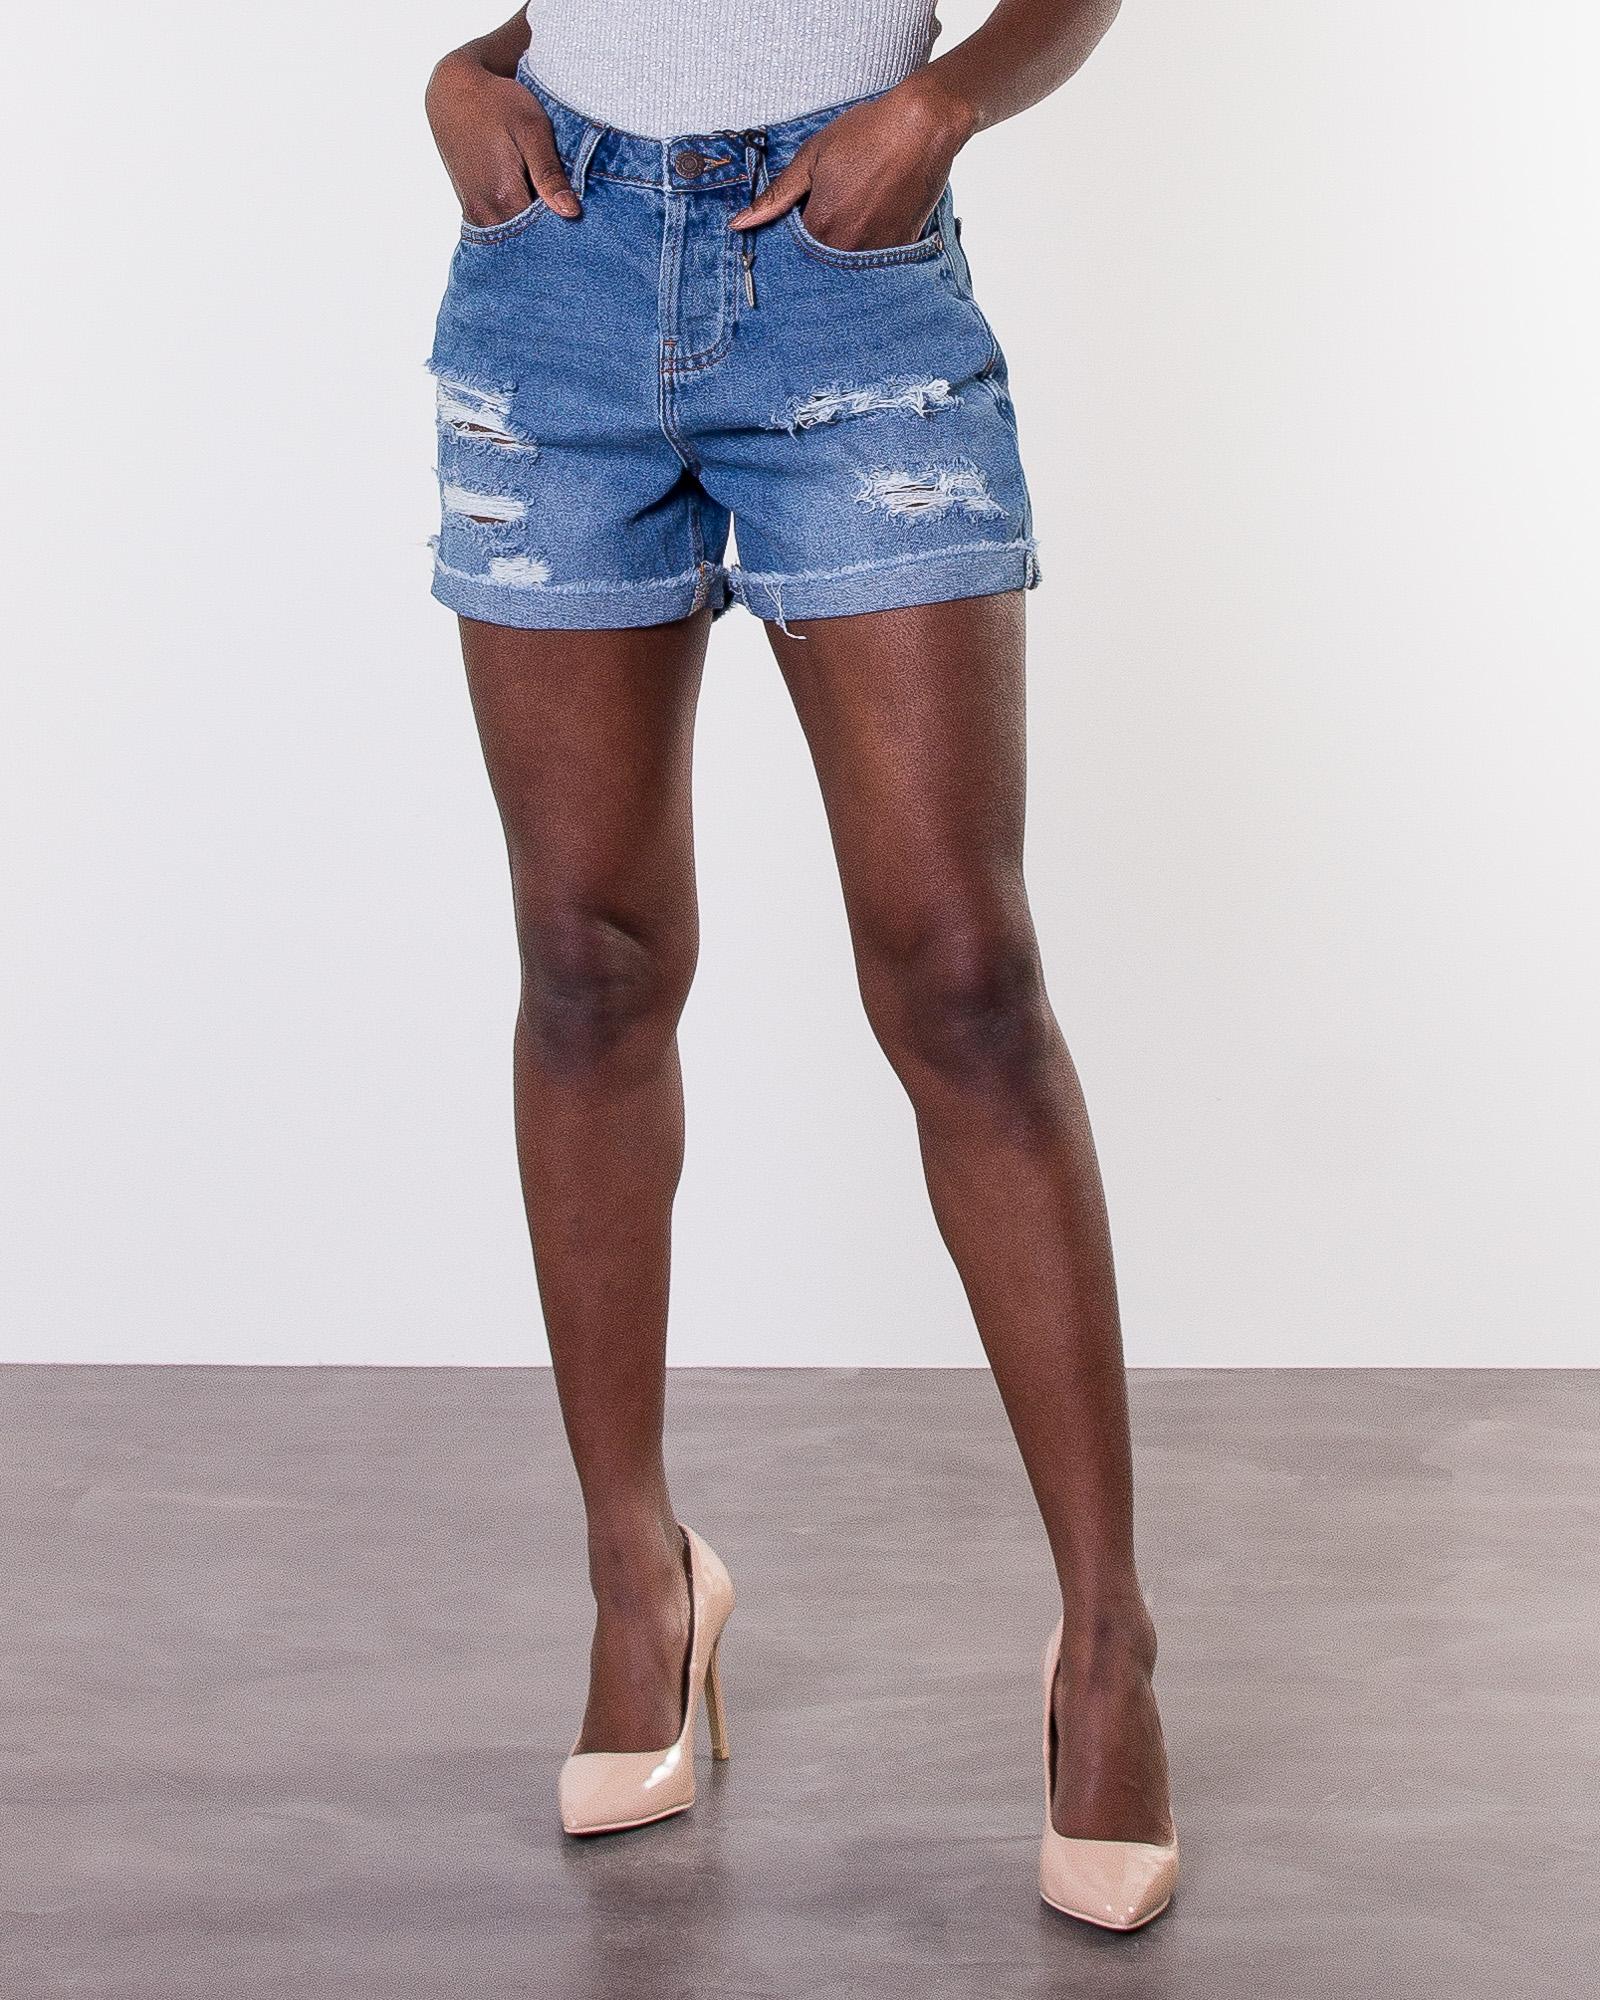 de304cb801 Noisy may, Be Liv Destroyed Denim Shorts Light Blue Denim | Women's ...